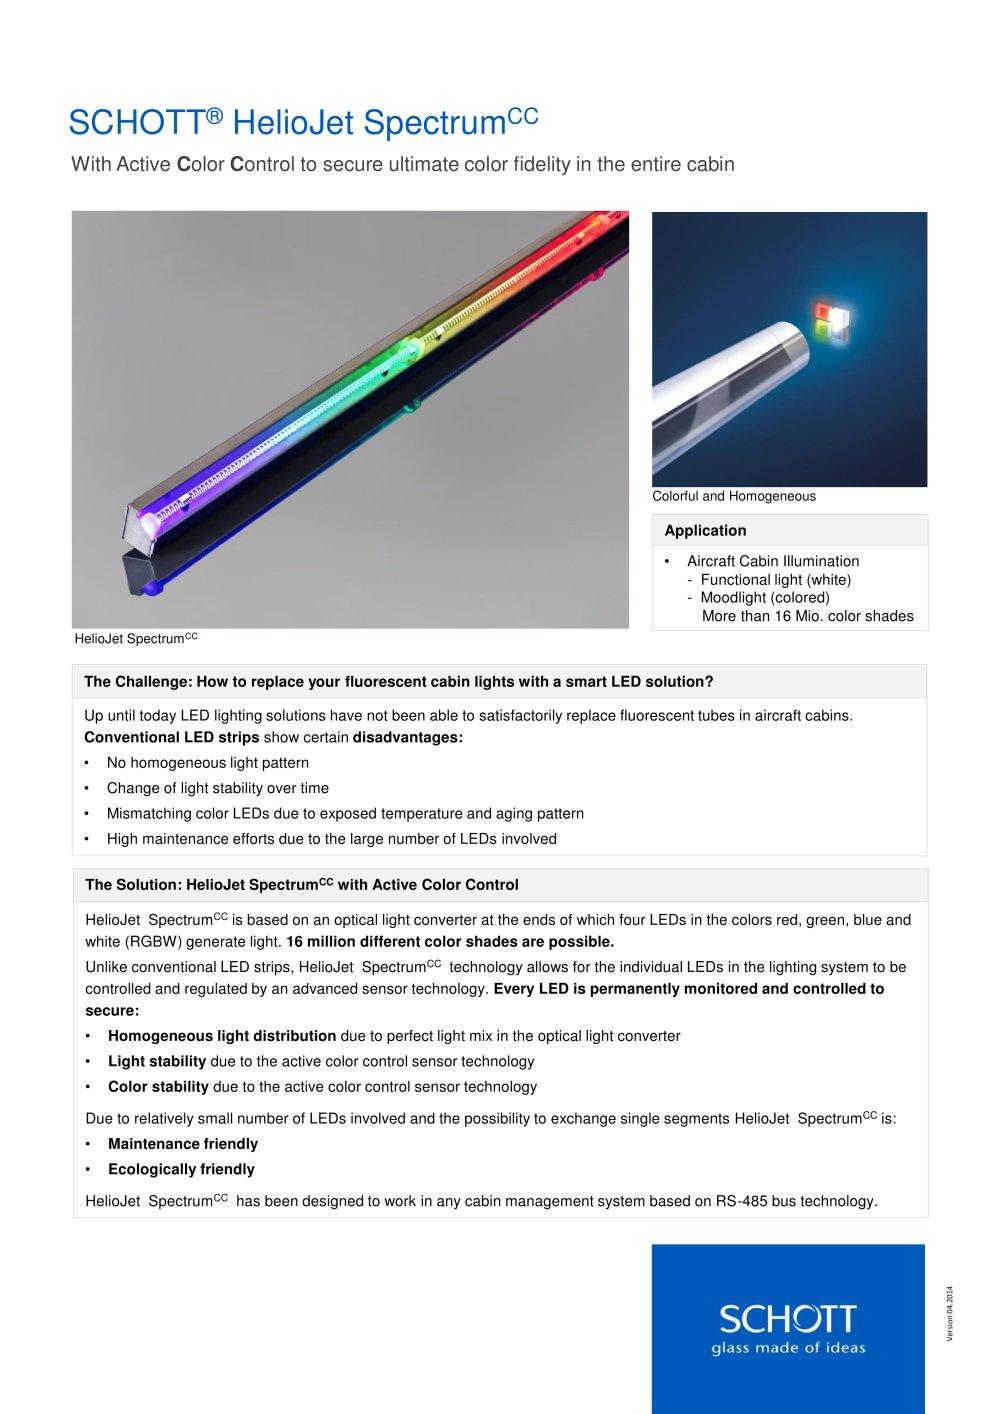 Schott Heliojet Spectrum Cc Schott Ag Pdf Catalogs Technical